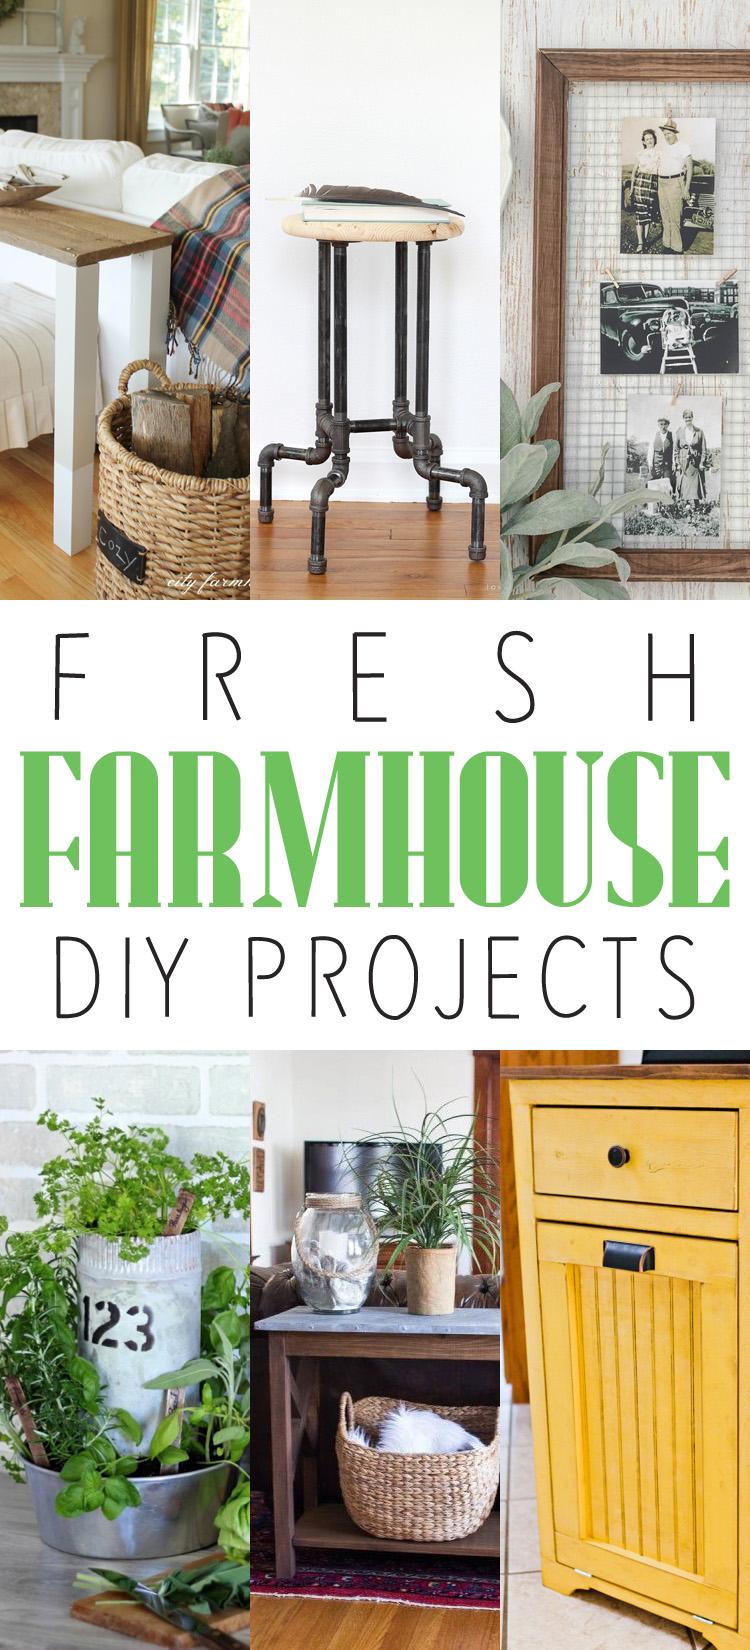 FarmhouseProjects-TOWER-0001